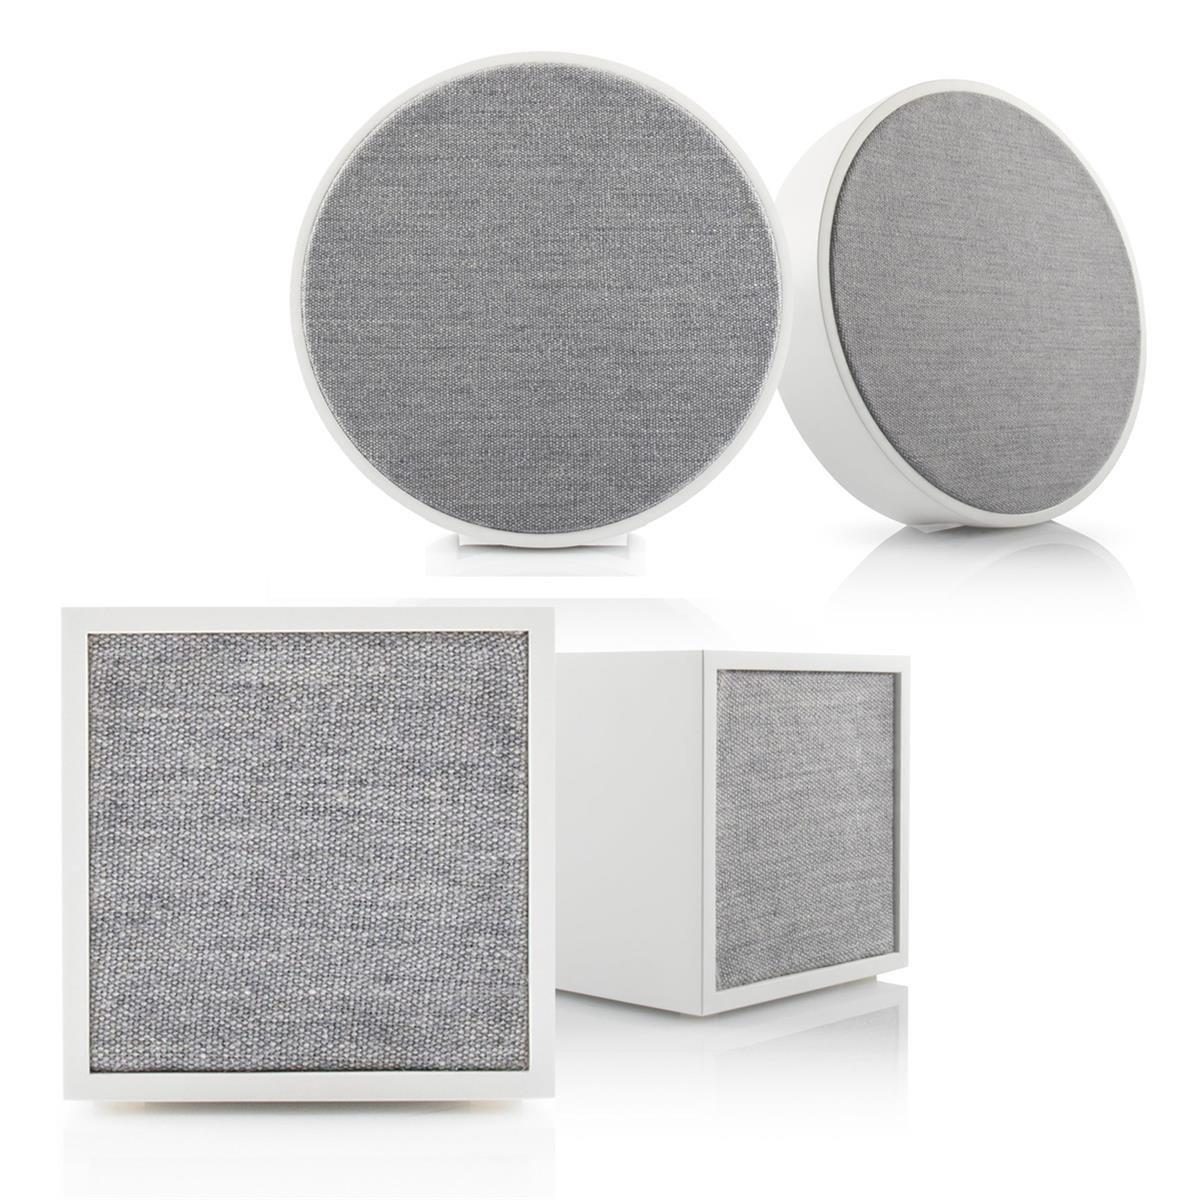 Tivoli Audio ART and CUBE Wireless Hi-Fi Music System - 4-Pack (White)